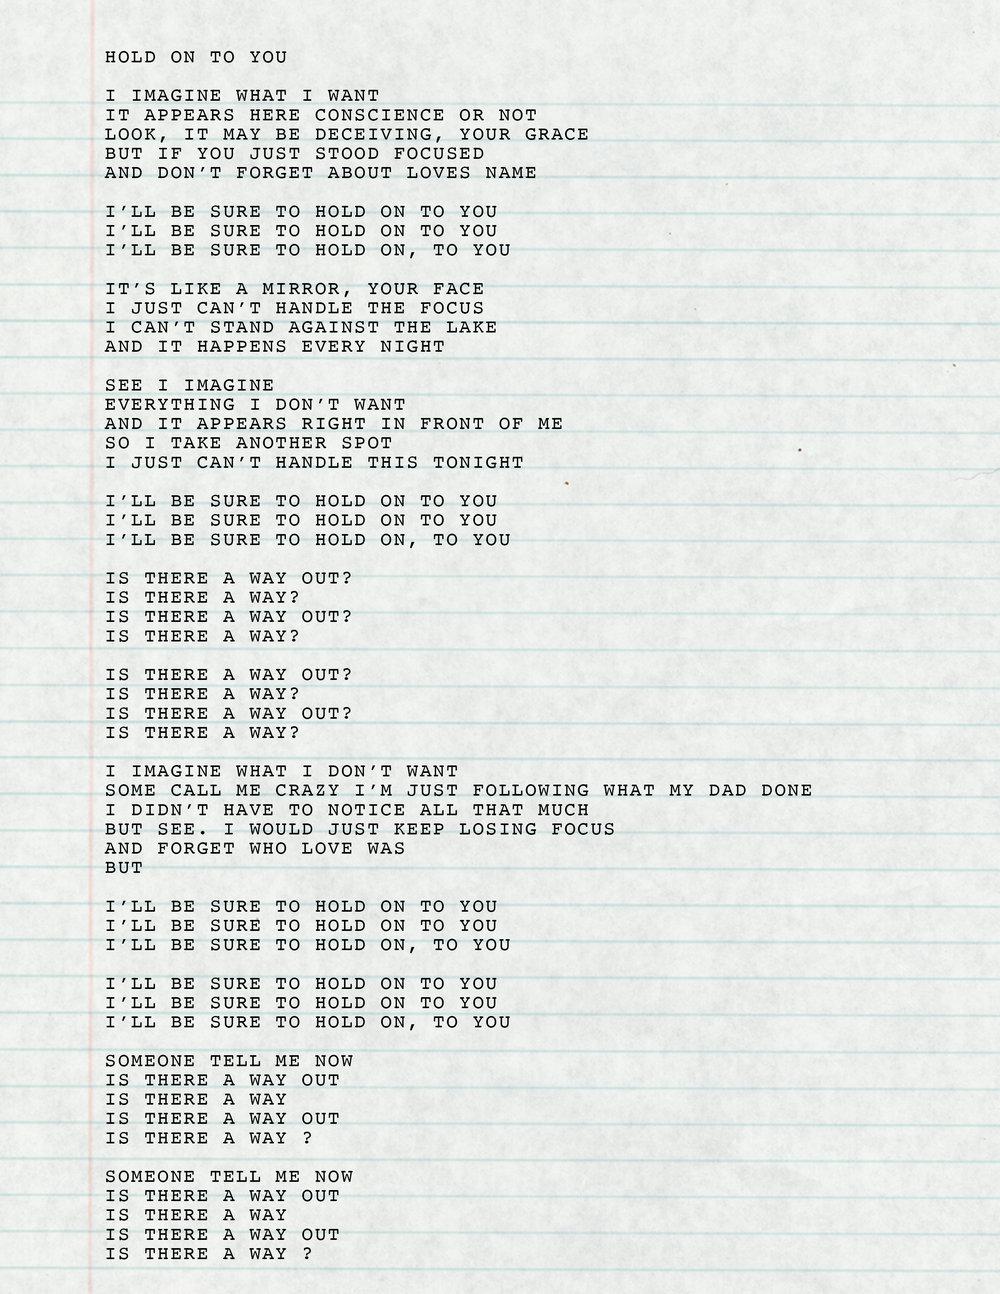 9. Hold On To You Lyrics.jpg